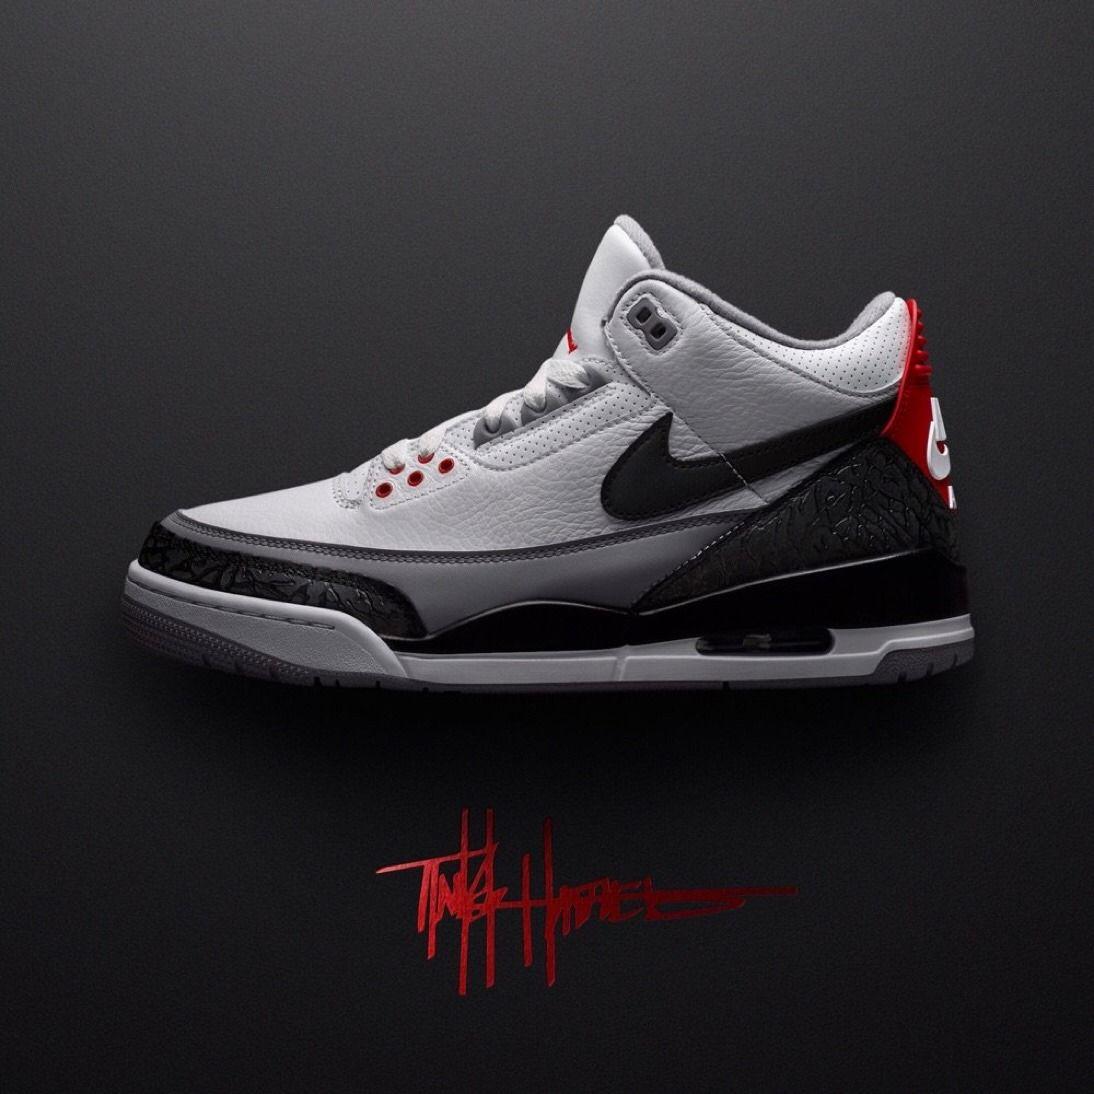 7f6c525bd9c943 Jordan 3 Retro Tinker NRG by blog.sneakerando.com sneakers sneakernews  StreetStyle Kicks adidas nike vans newbalance puma ADIDAS ASICS CONVERSE  DIADORA ...